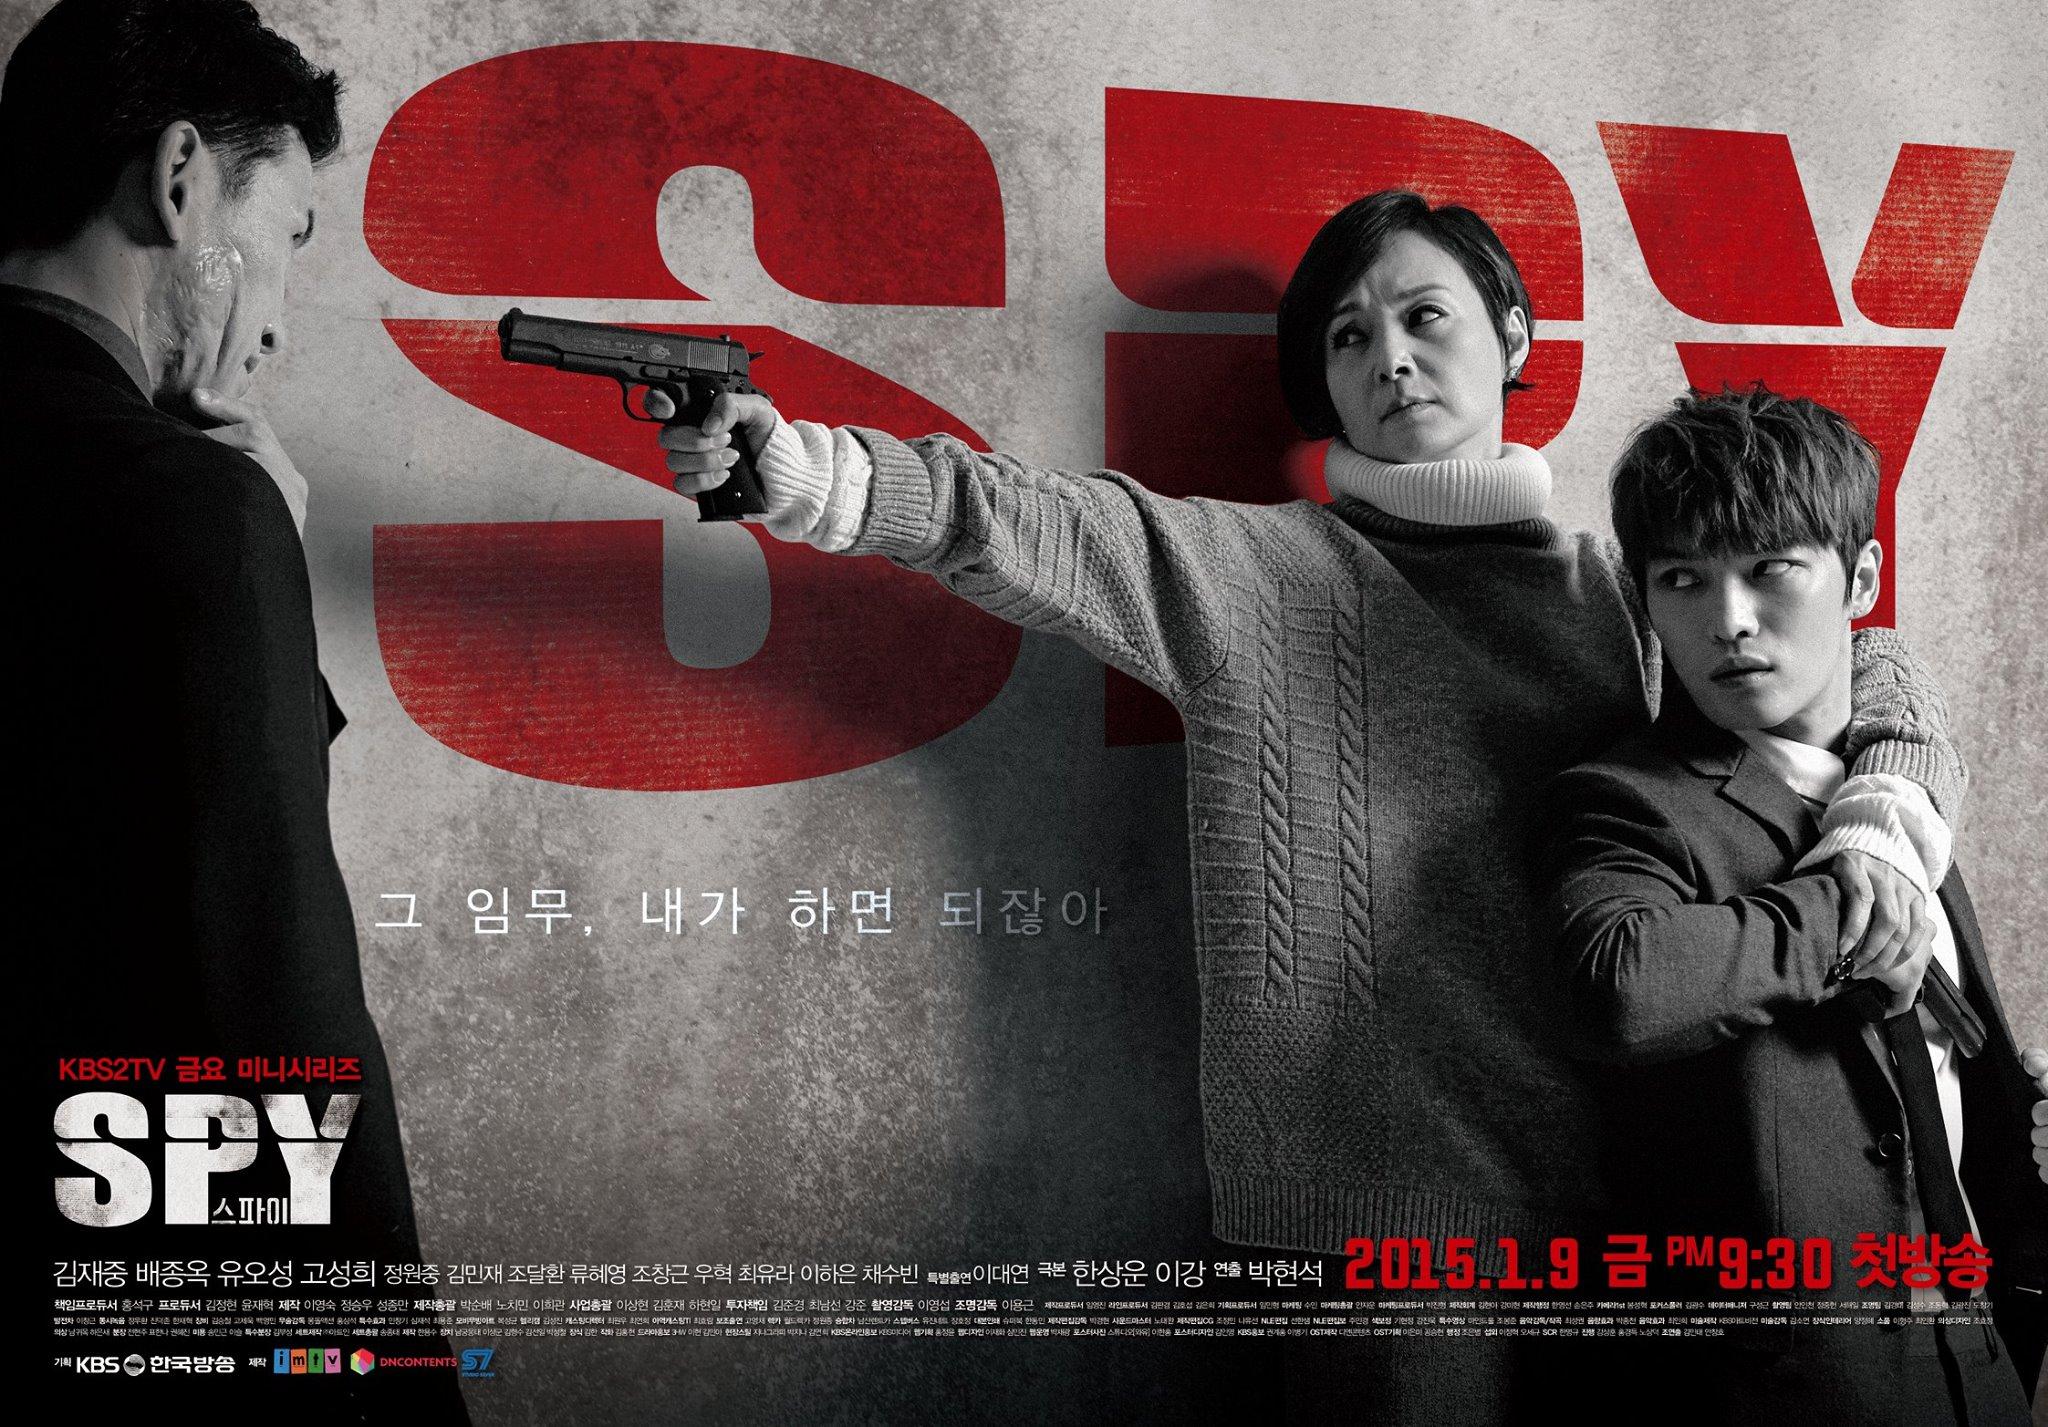 spy jaejoong